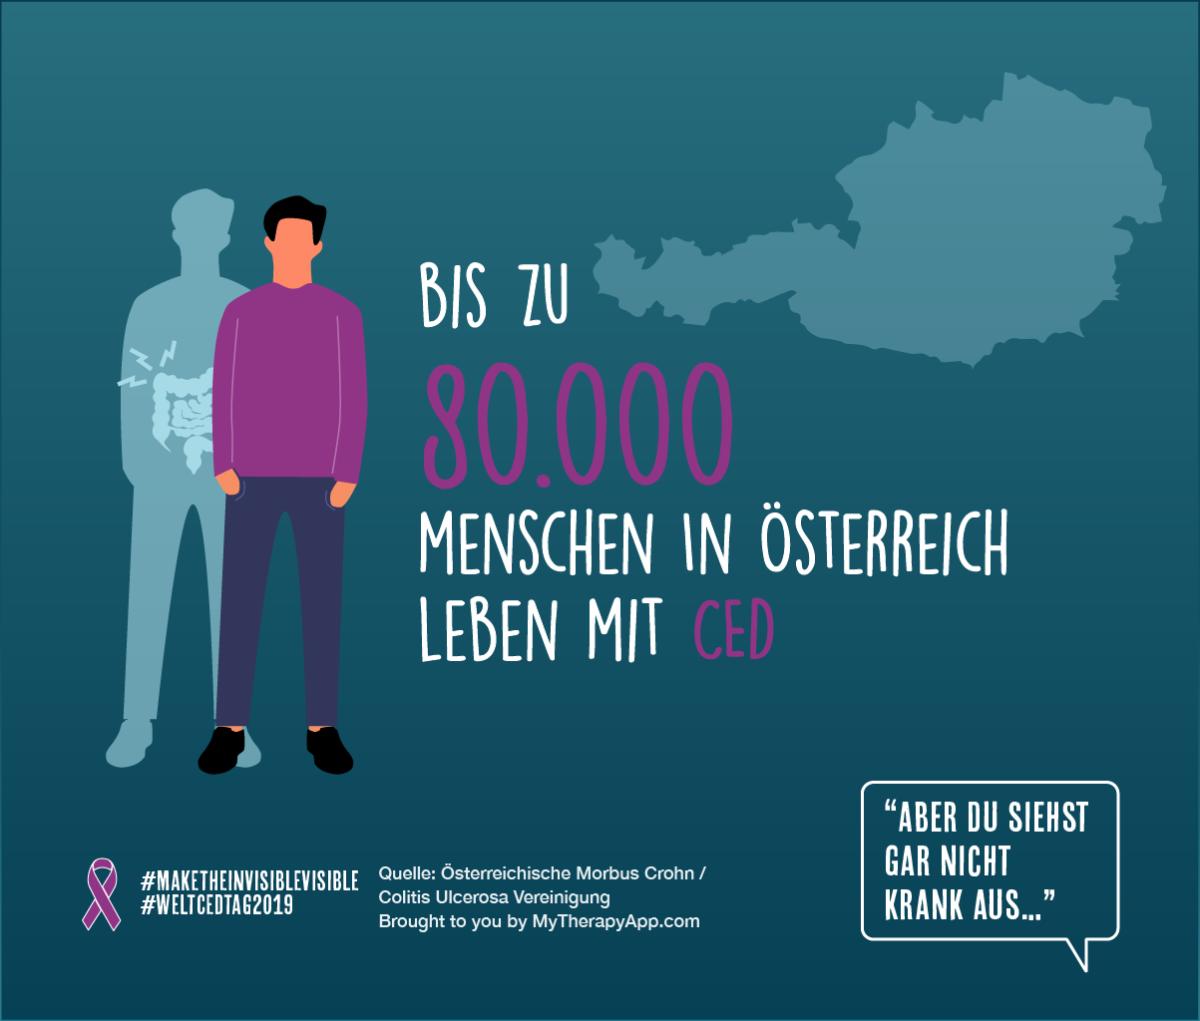 world ibd day 2019 at - Welt-CED-Tag & 40 Fakten über Morbus Crohn